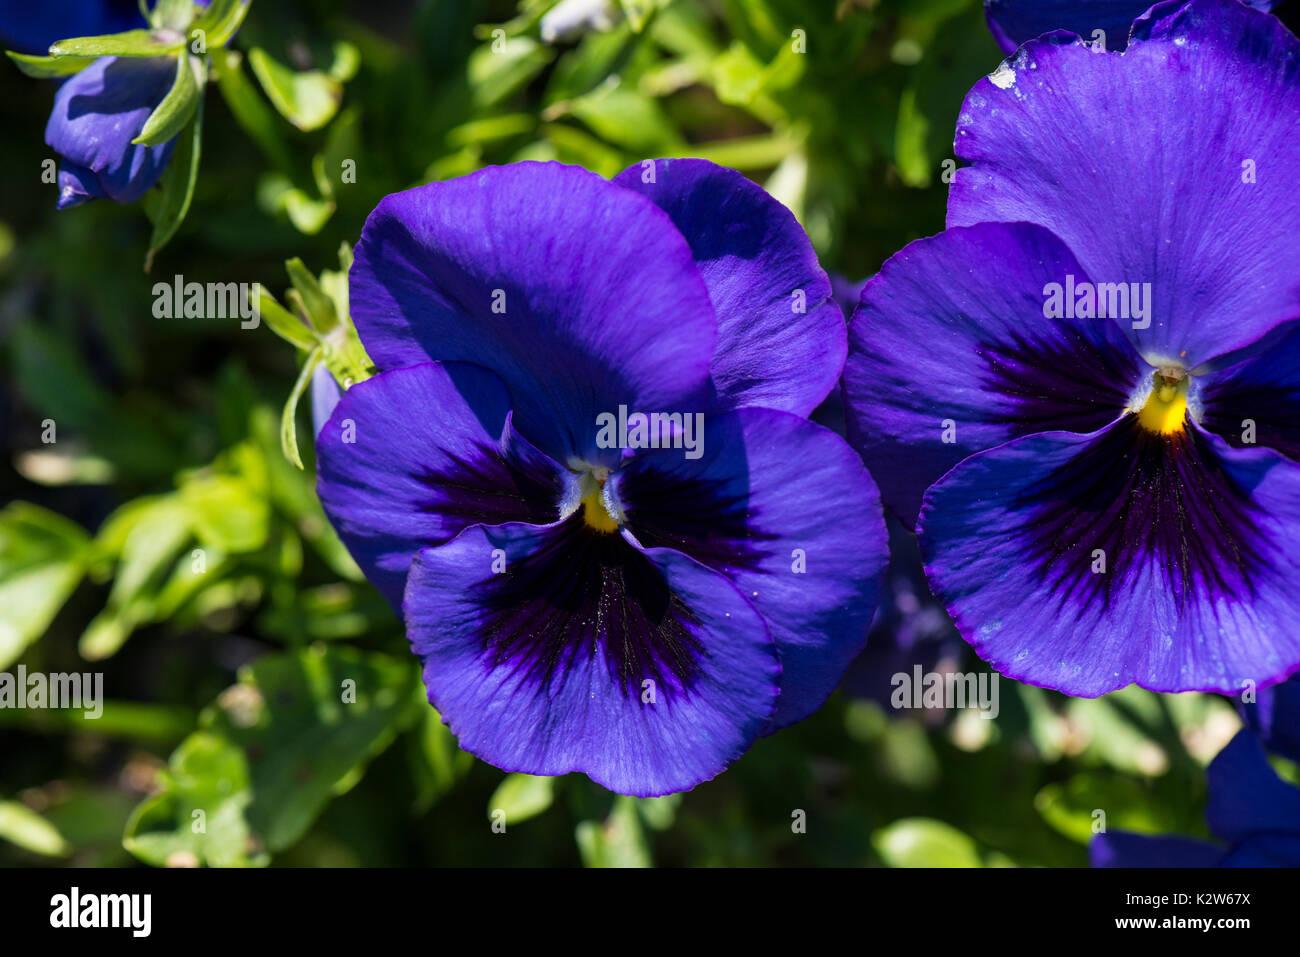 Blue pansies (Viola tricolor var. hortensis) - Stock Image